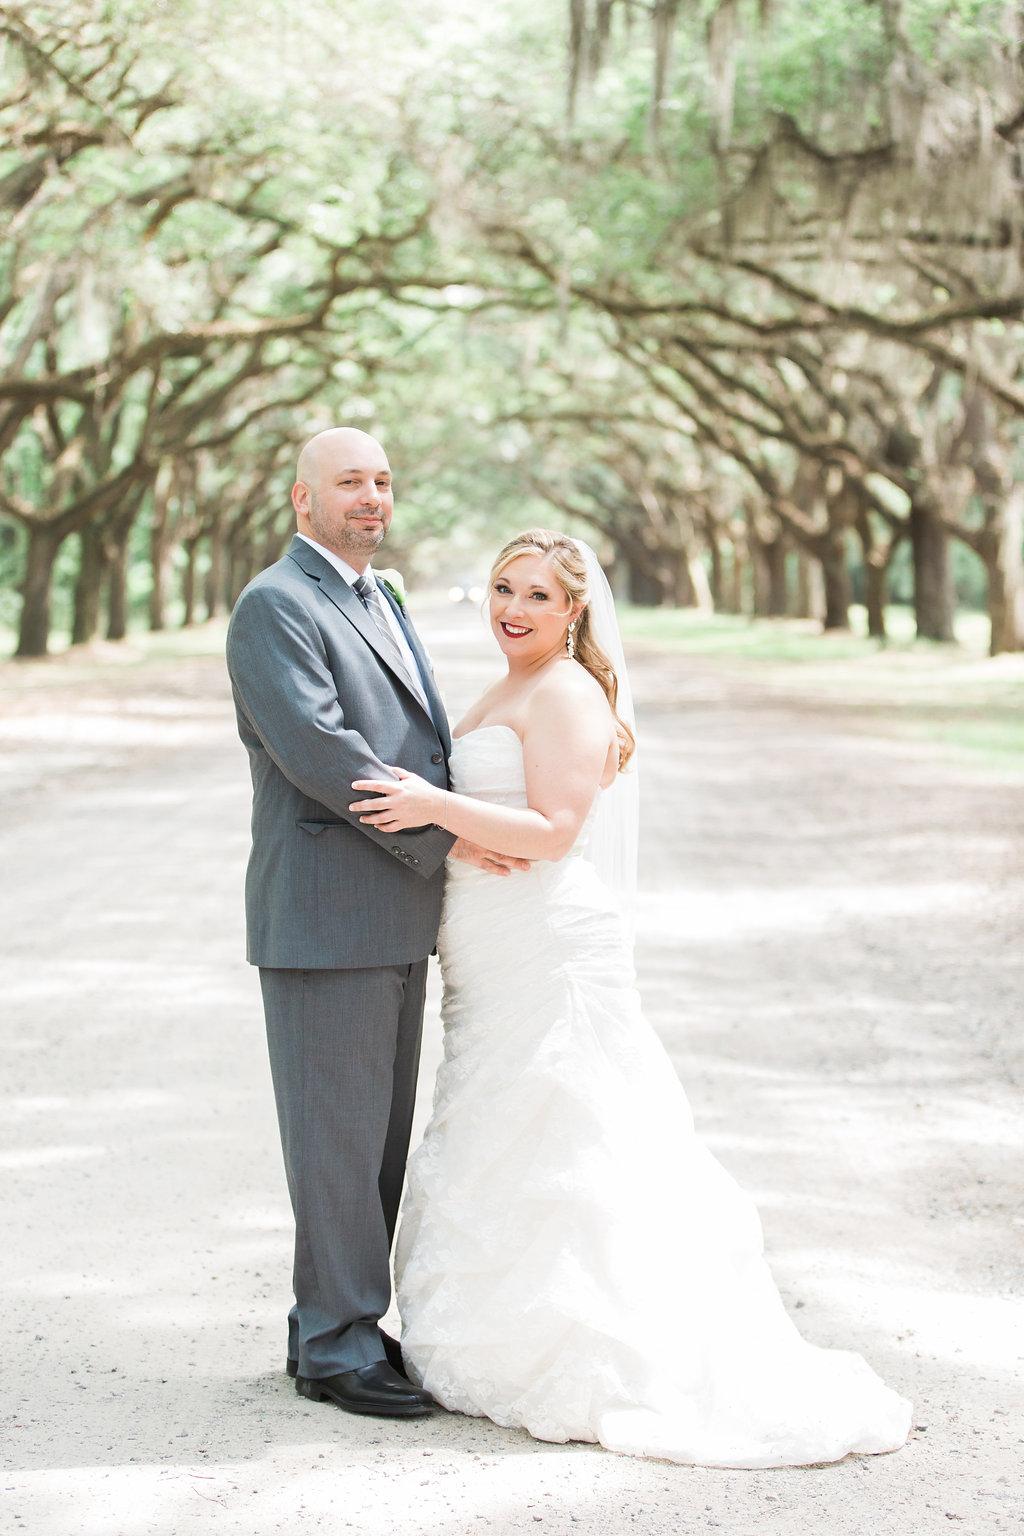 kristin-and-darren-wedding-soho-south-cafe-wormsloe-apt-b-photography-savannah-wedding-planner-savannah-weddings-southern-weddings-best-savannah-wedding-planner-9.JPG